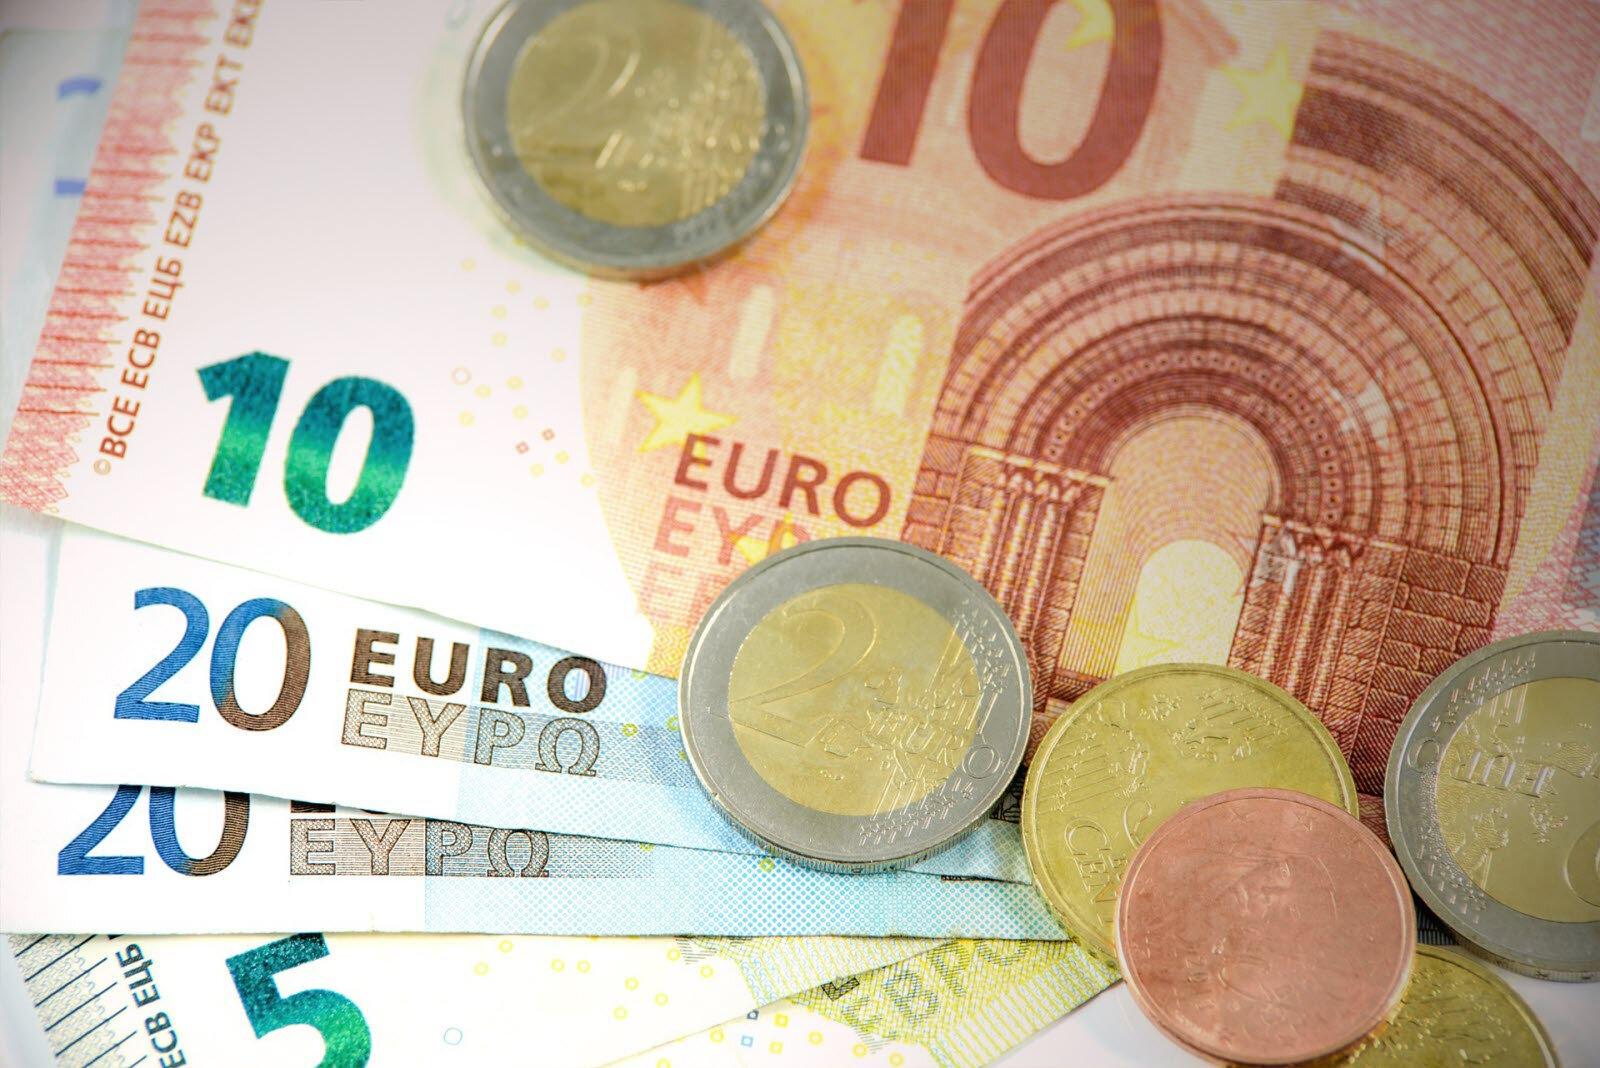 GAGNER AU LOTO ET A EURO MILLIONS CHANCE JEUX LOTO: MARABOUT SOWOKA YARI